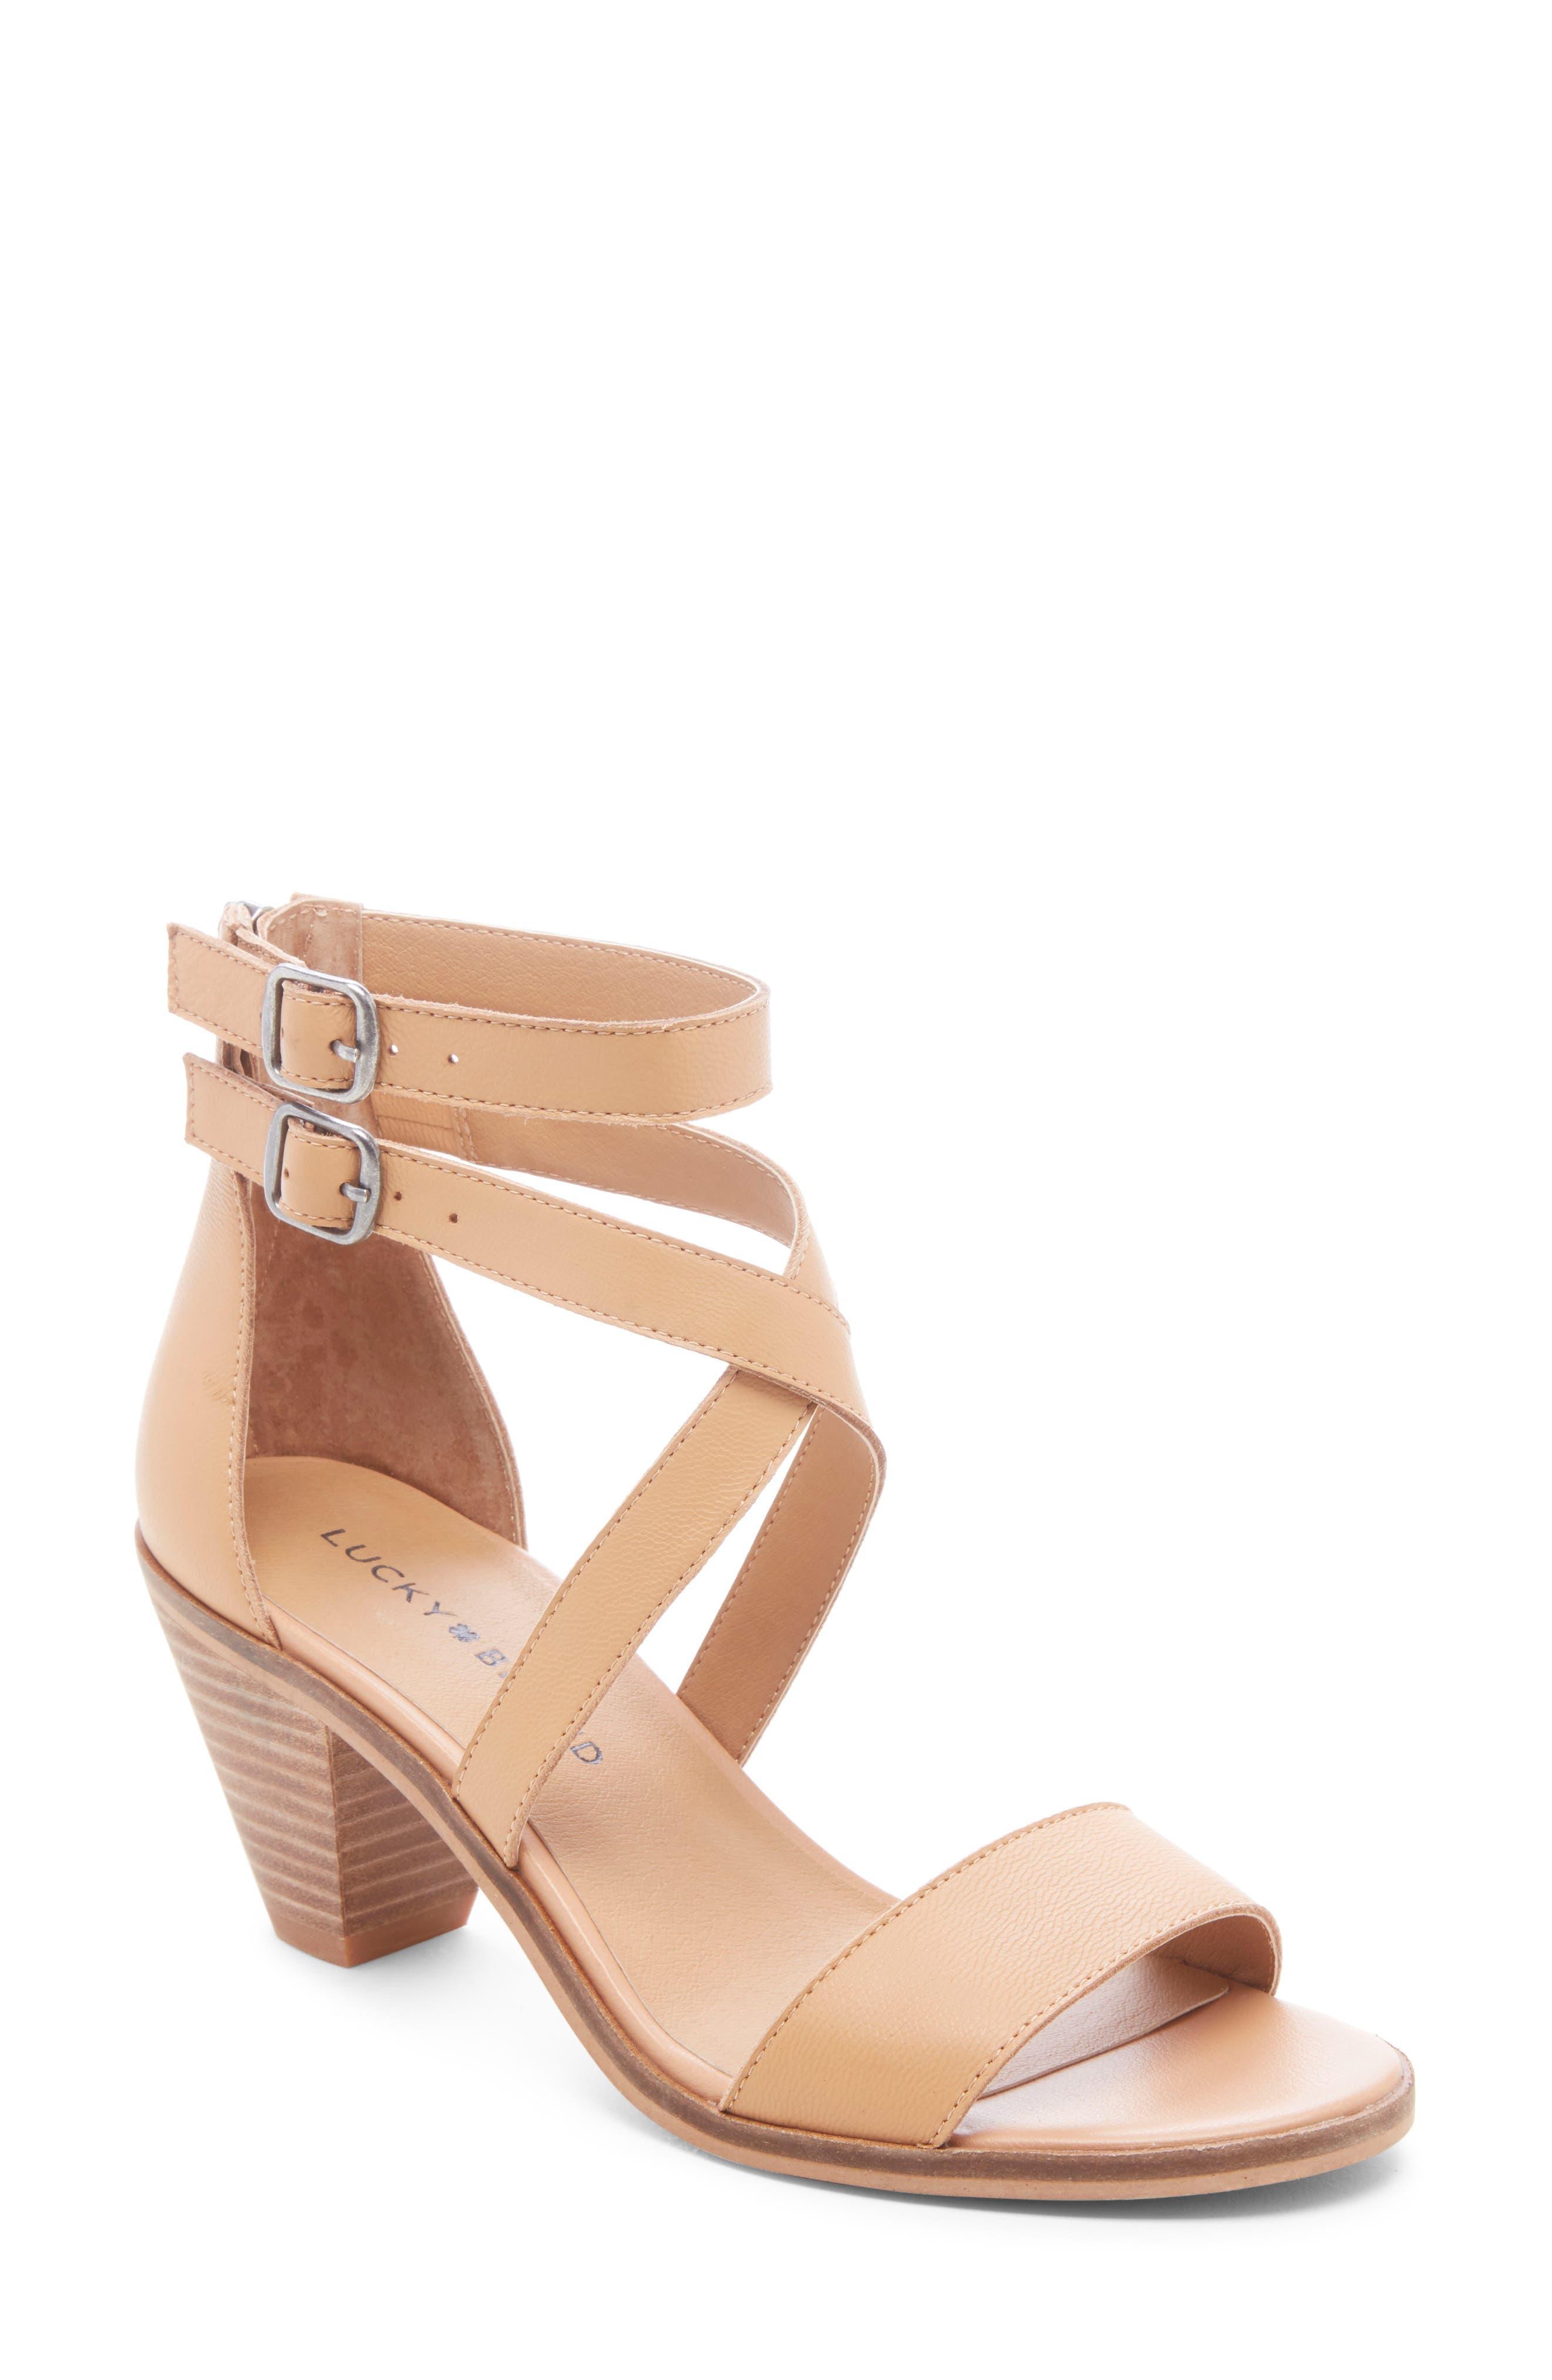 Lucky Brand Sandals and Flip-Flops